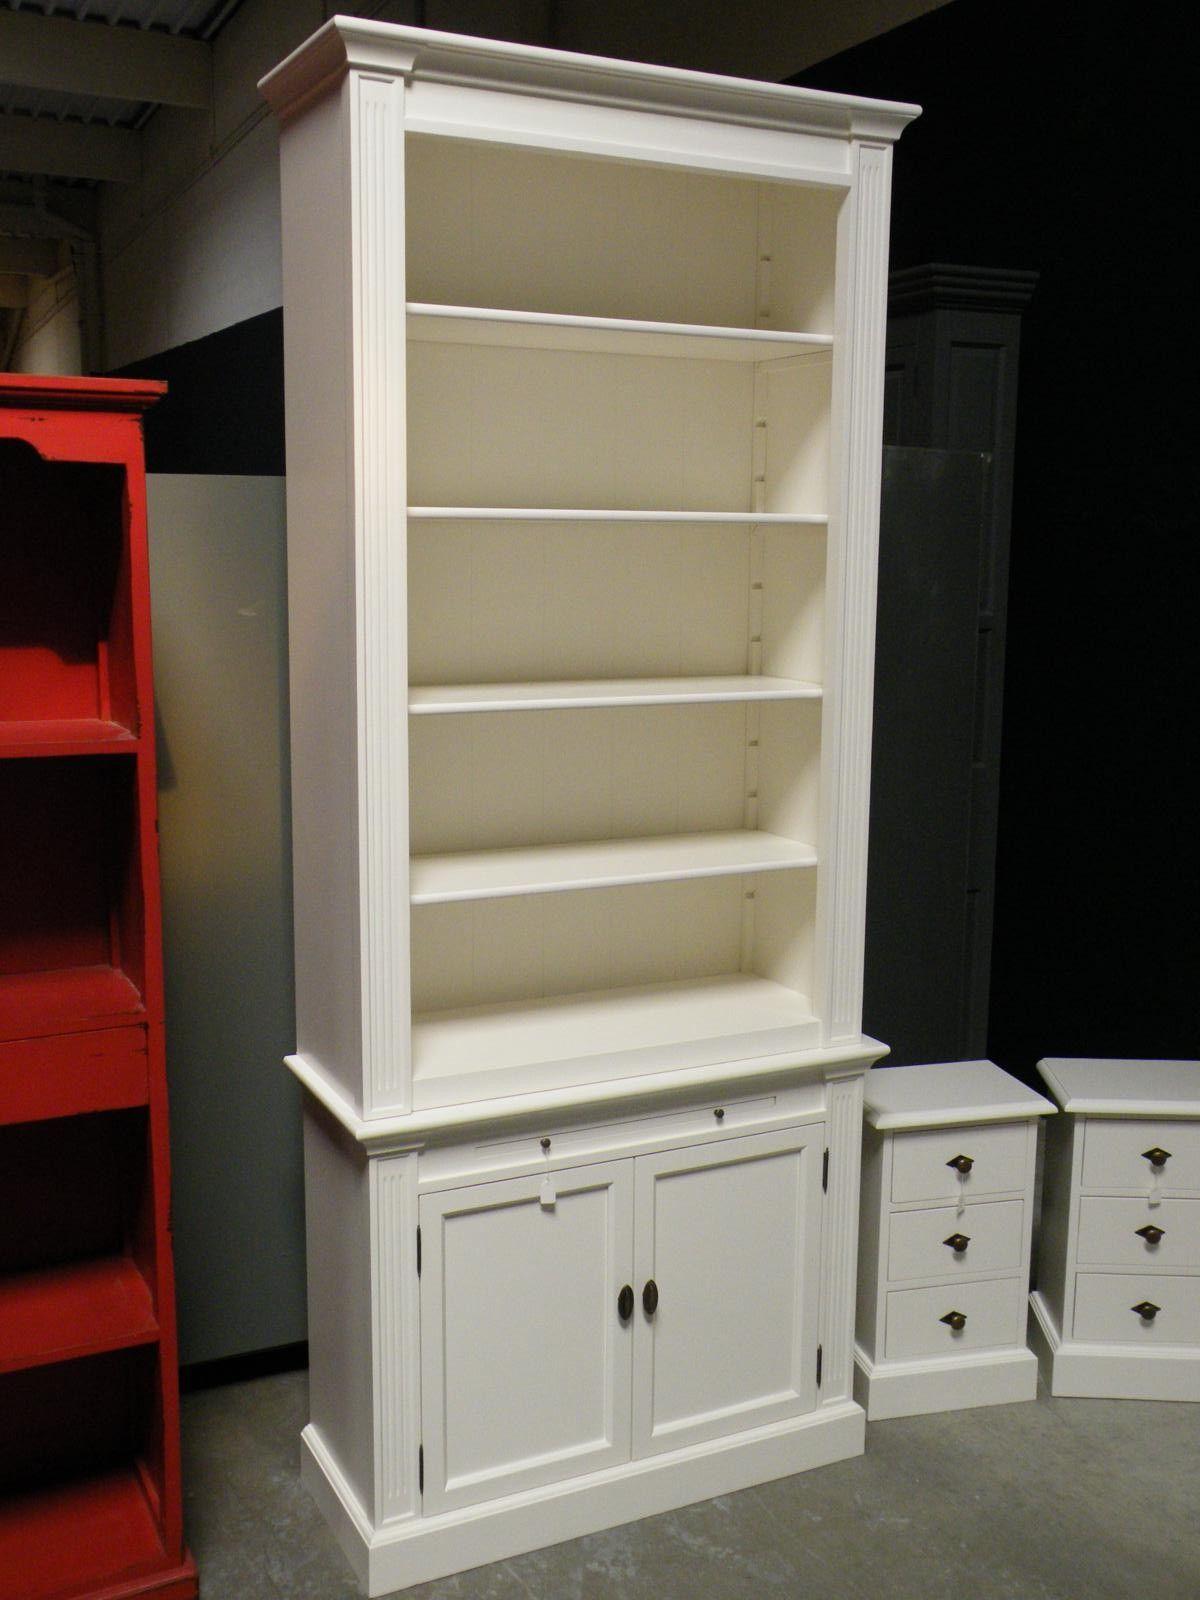 b cherregal regal schrank bibliothek landhausstil landhaus shabby chic wei massiv neu. Black Bedroom Furniture Sets. Home Design Ideas